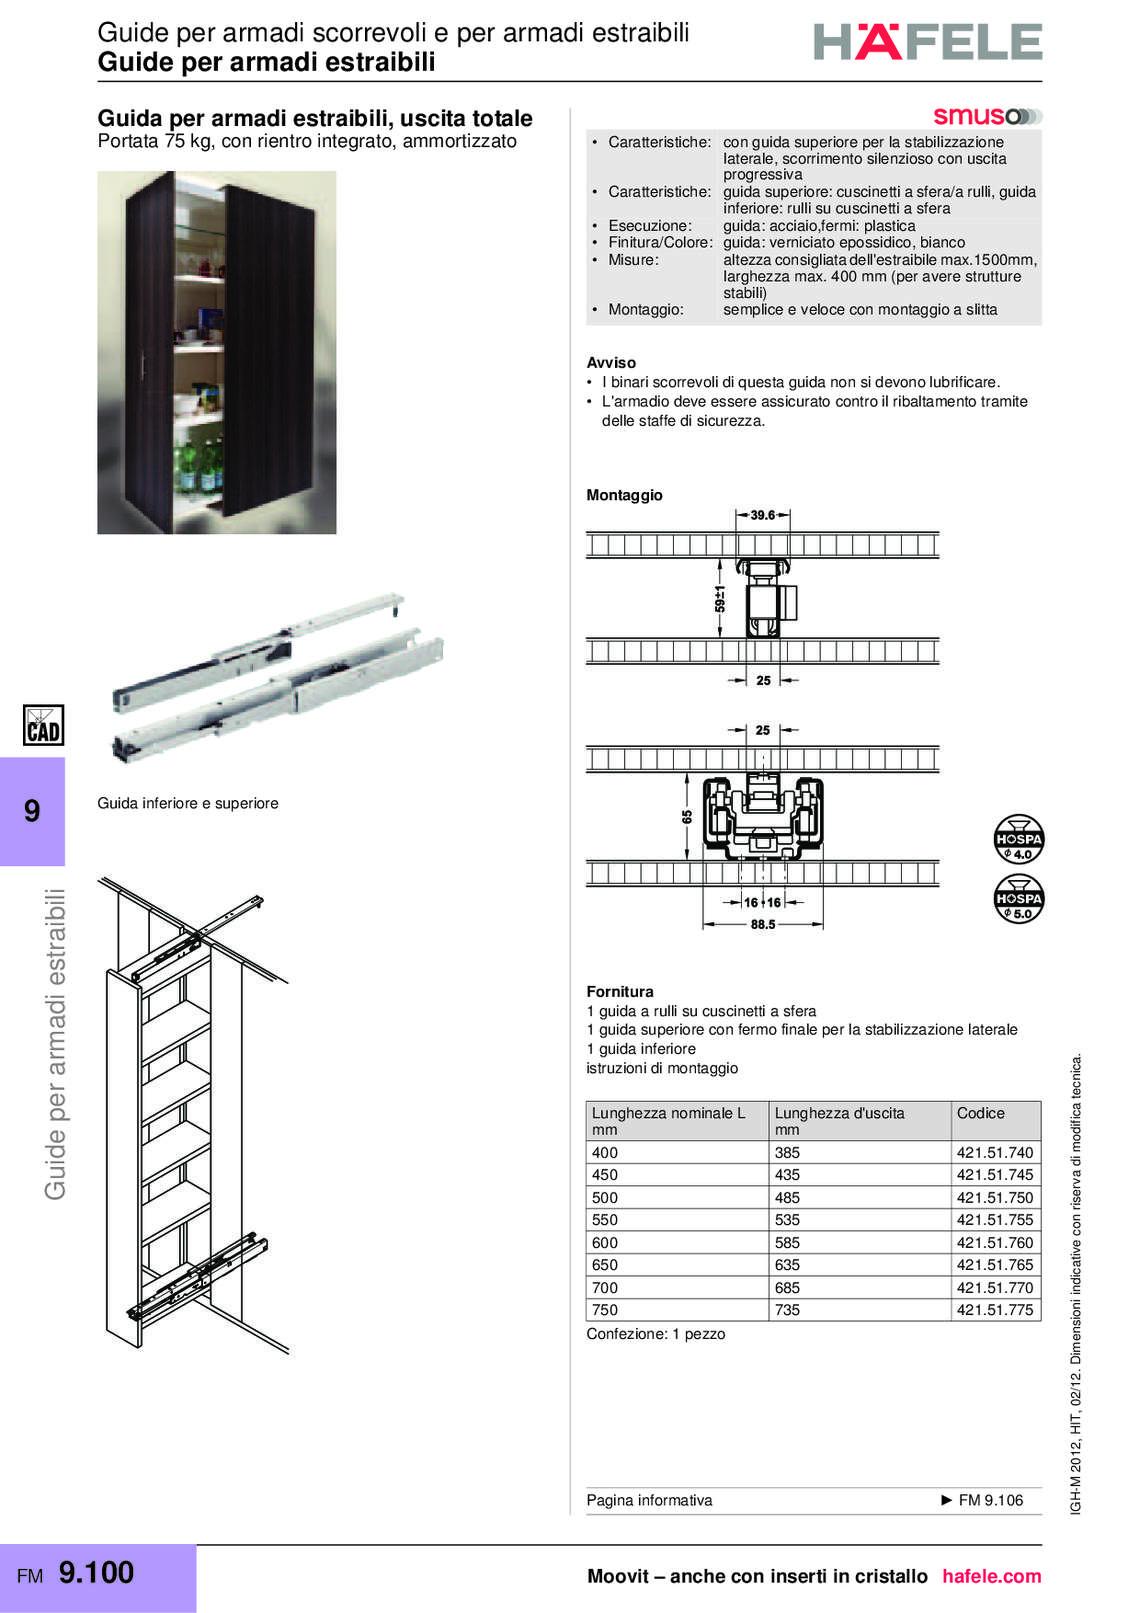 hafele-spondine-e-guide-per-mobili_40_147.jpg